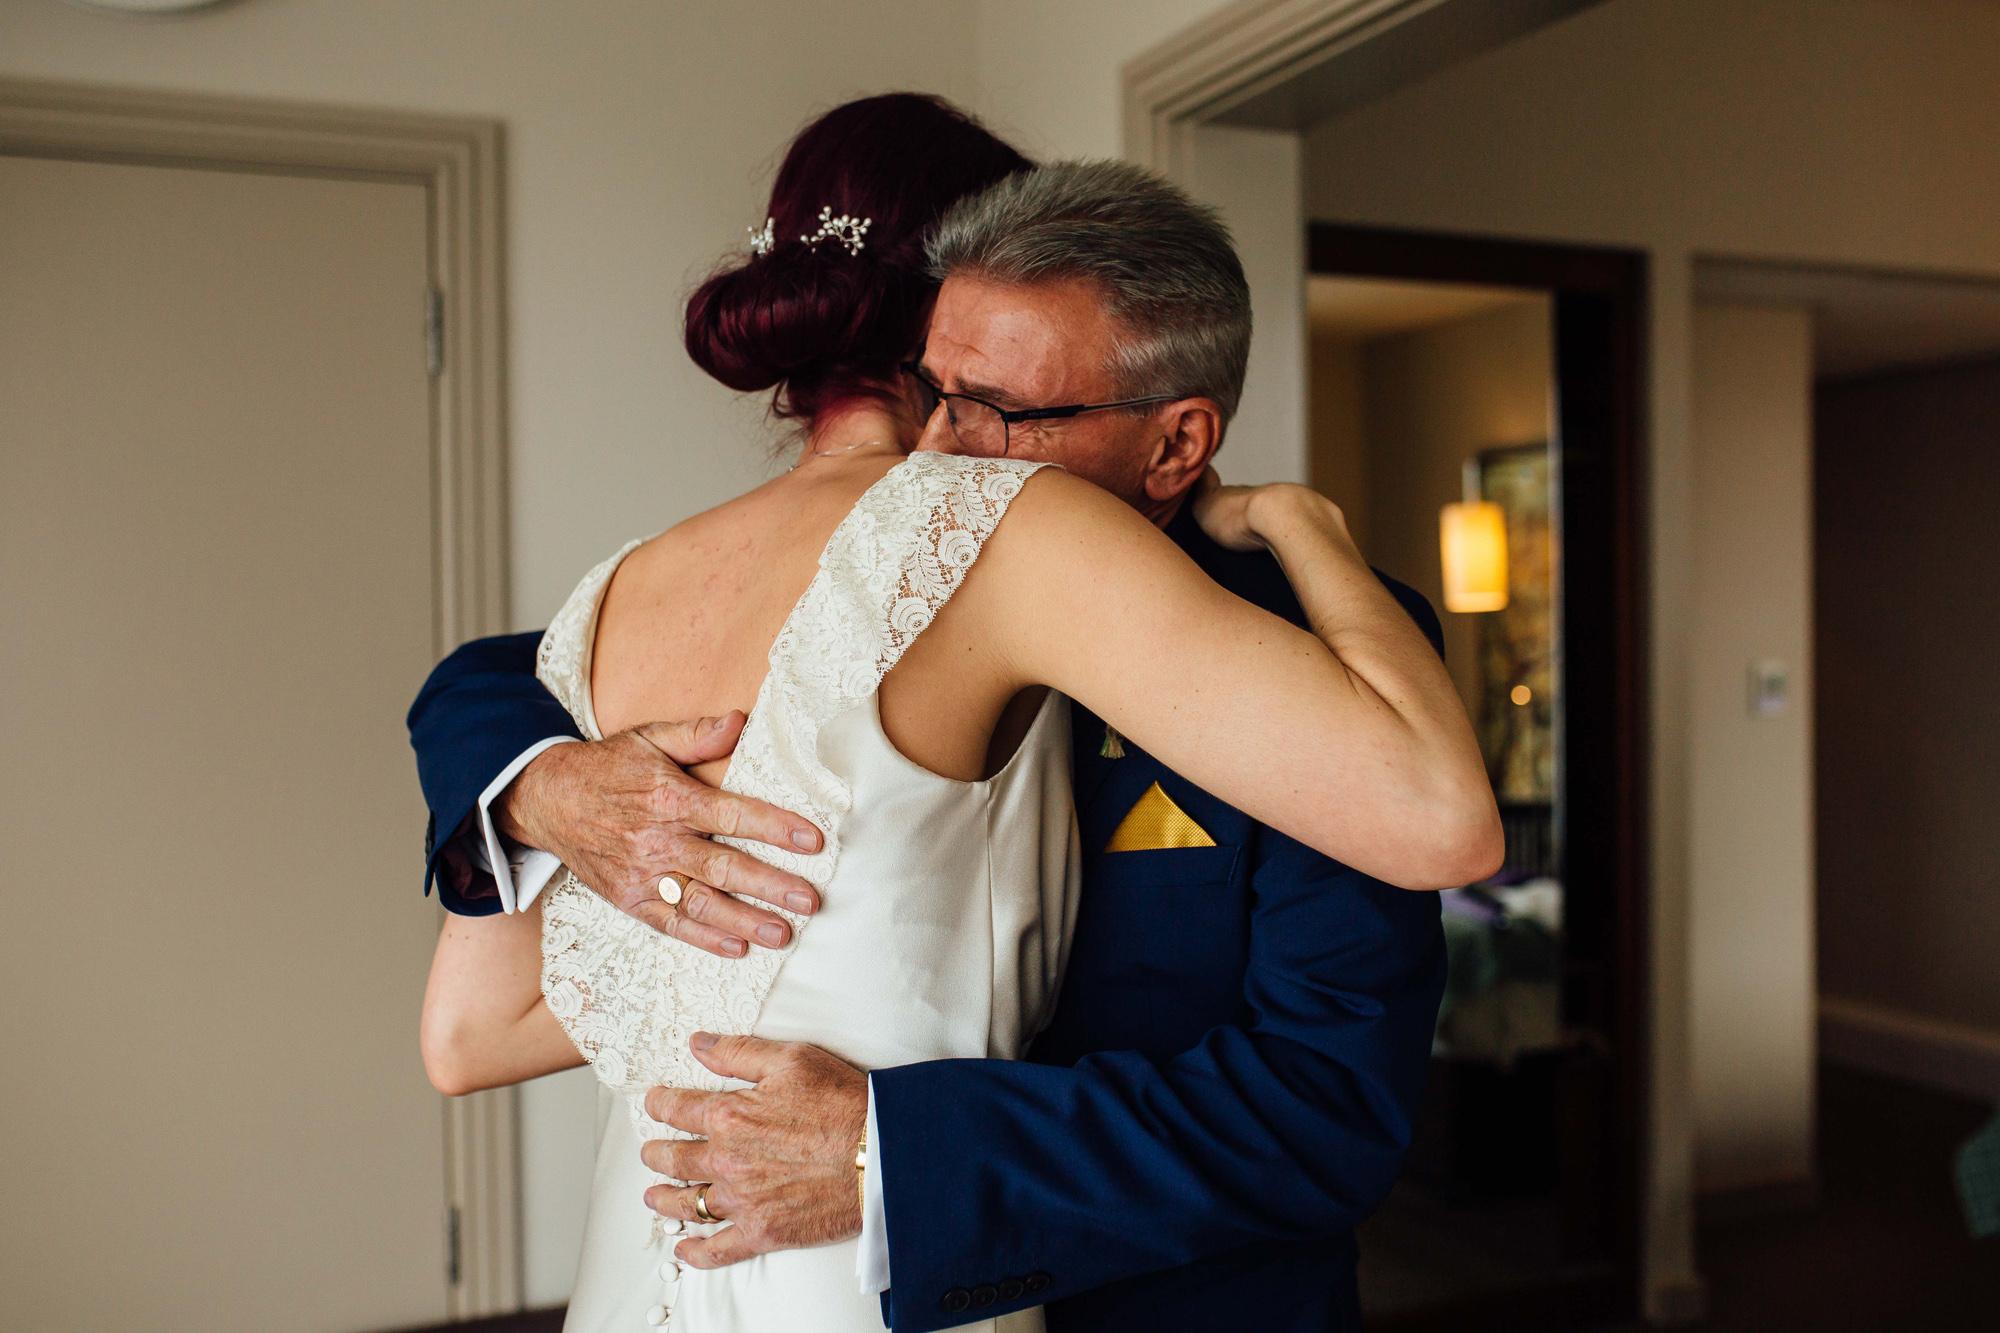 Sarah-Honeysuckle-Bias-Cut-Silk-Vintage-Inspired-Wedding-Gown-Sheffield-Wedding-Kate-Beaumont-5.jpg